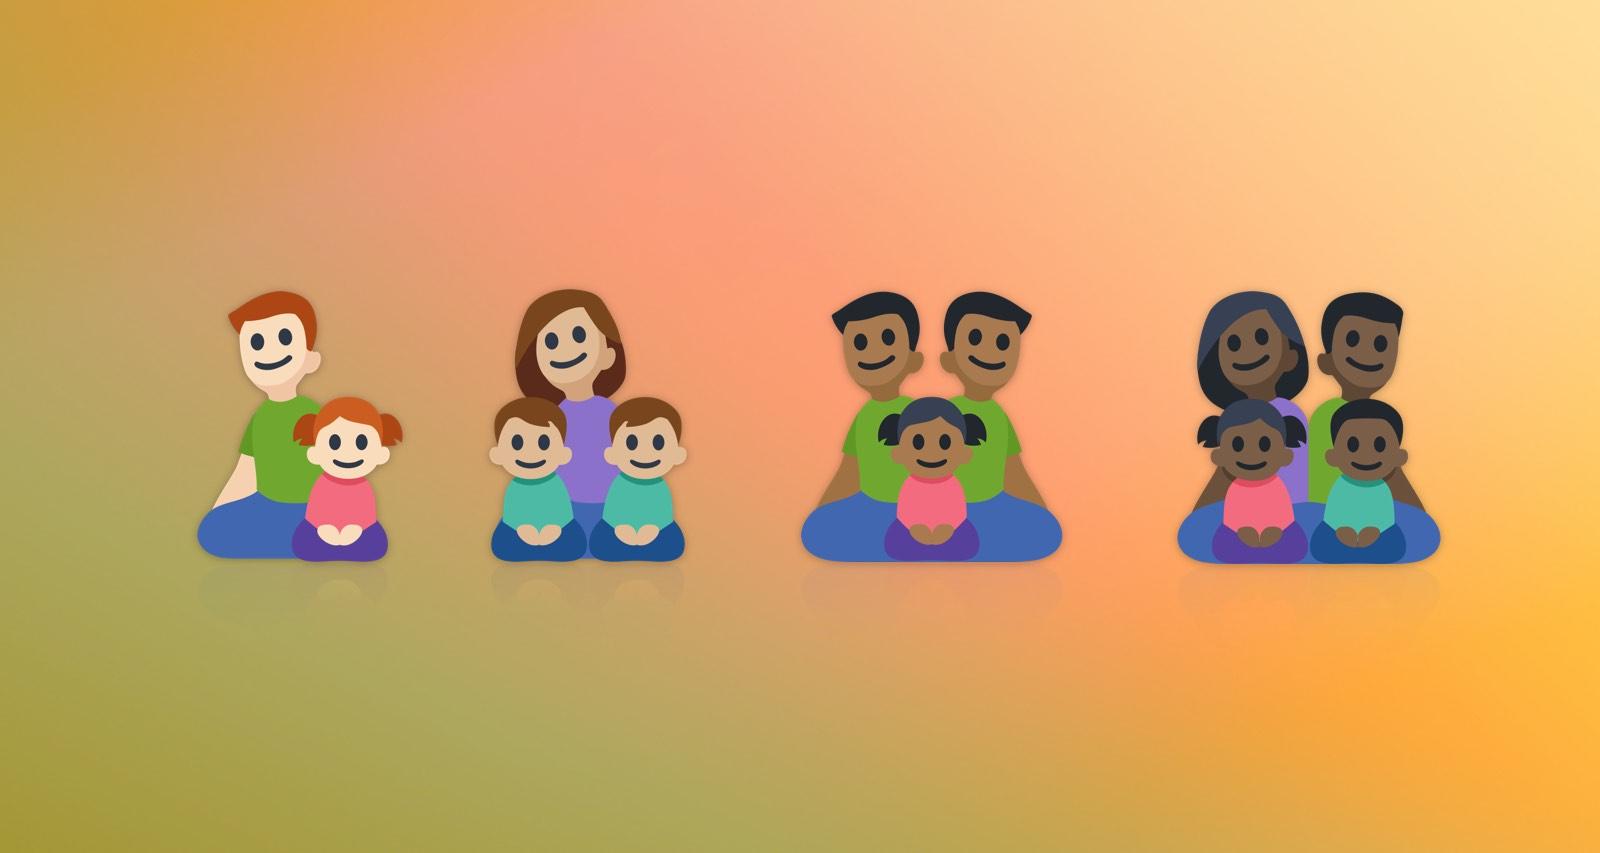 facebook adds black family emojis